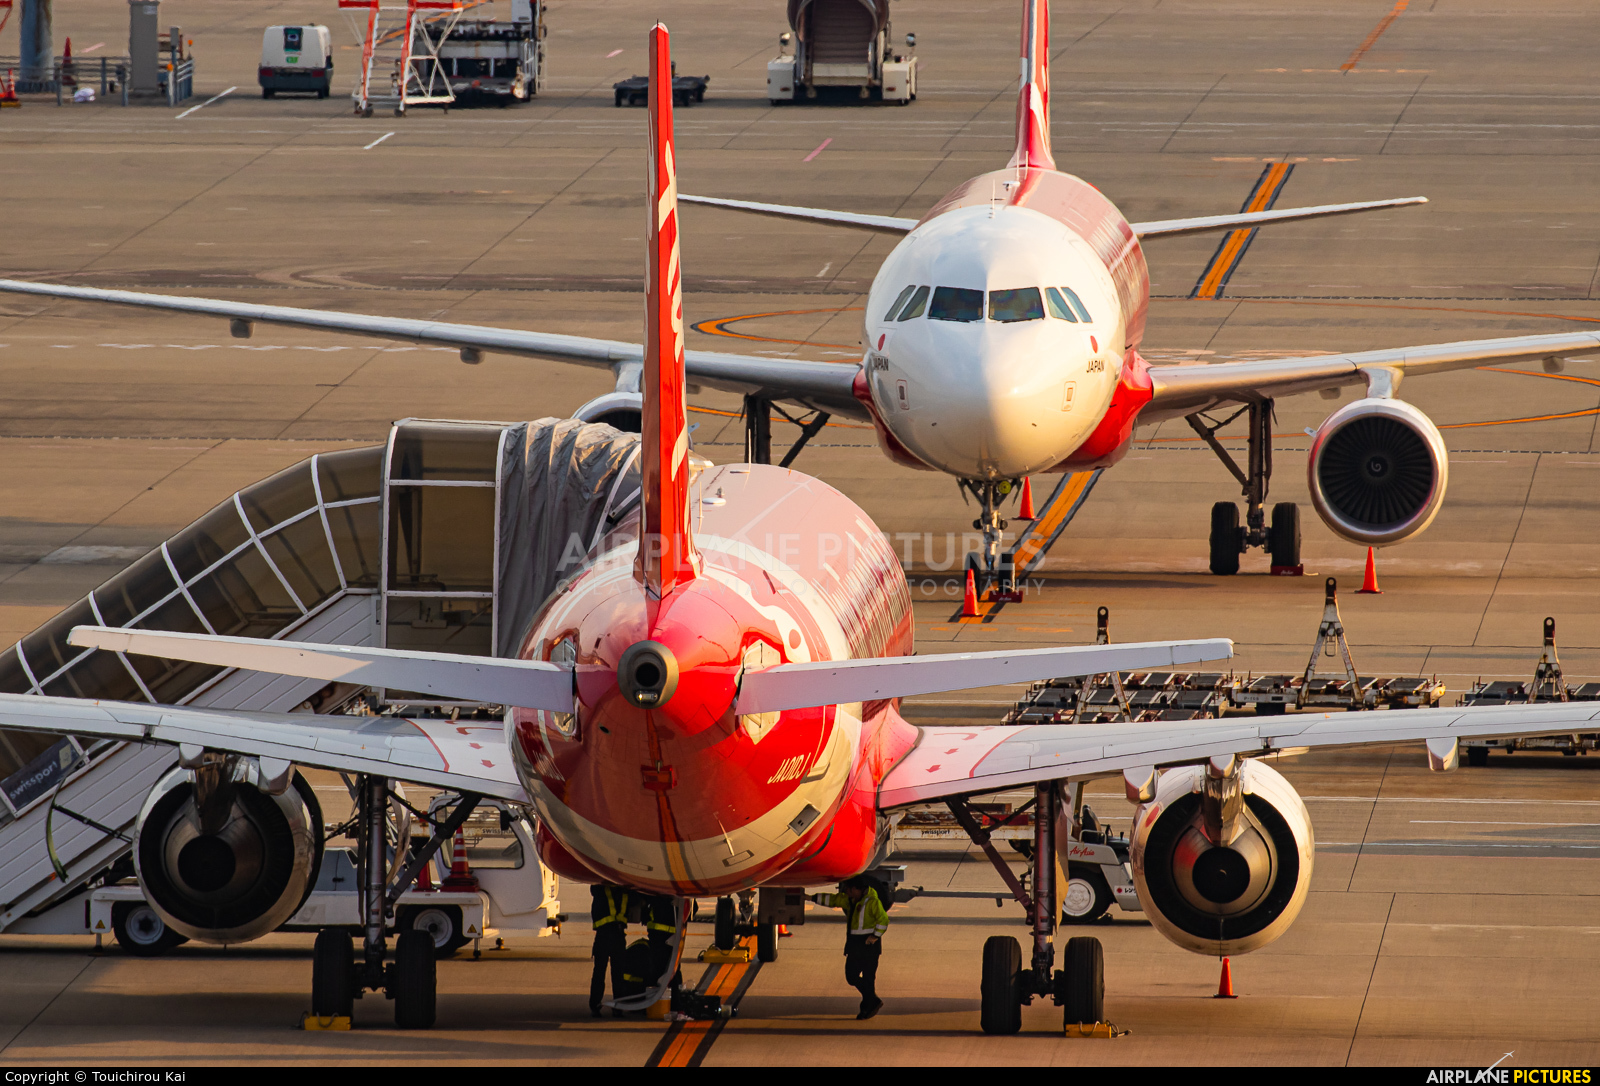 AirAsia (Japan) JA01DJ aircraft at Chubu Centrair Intl